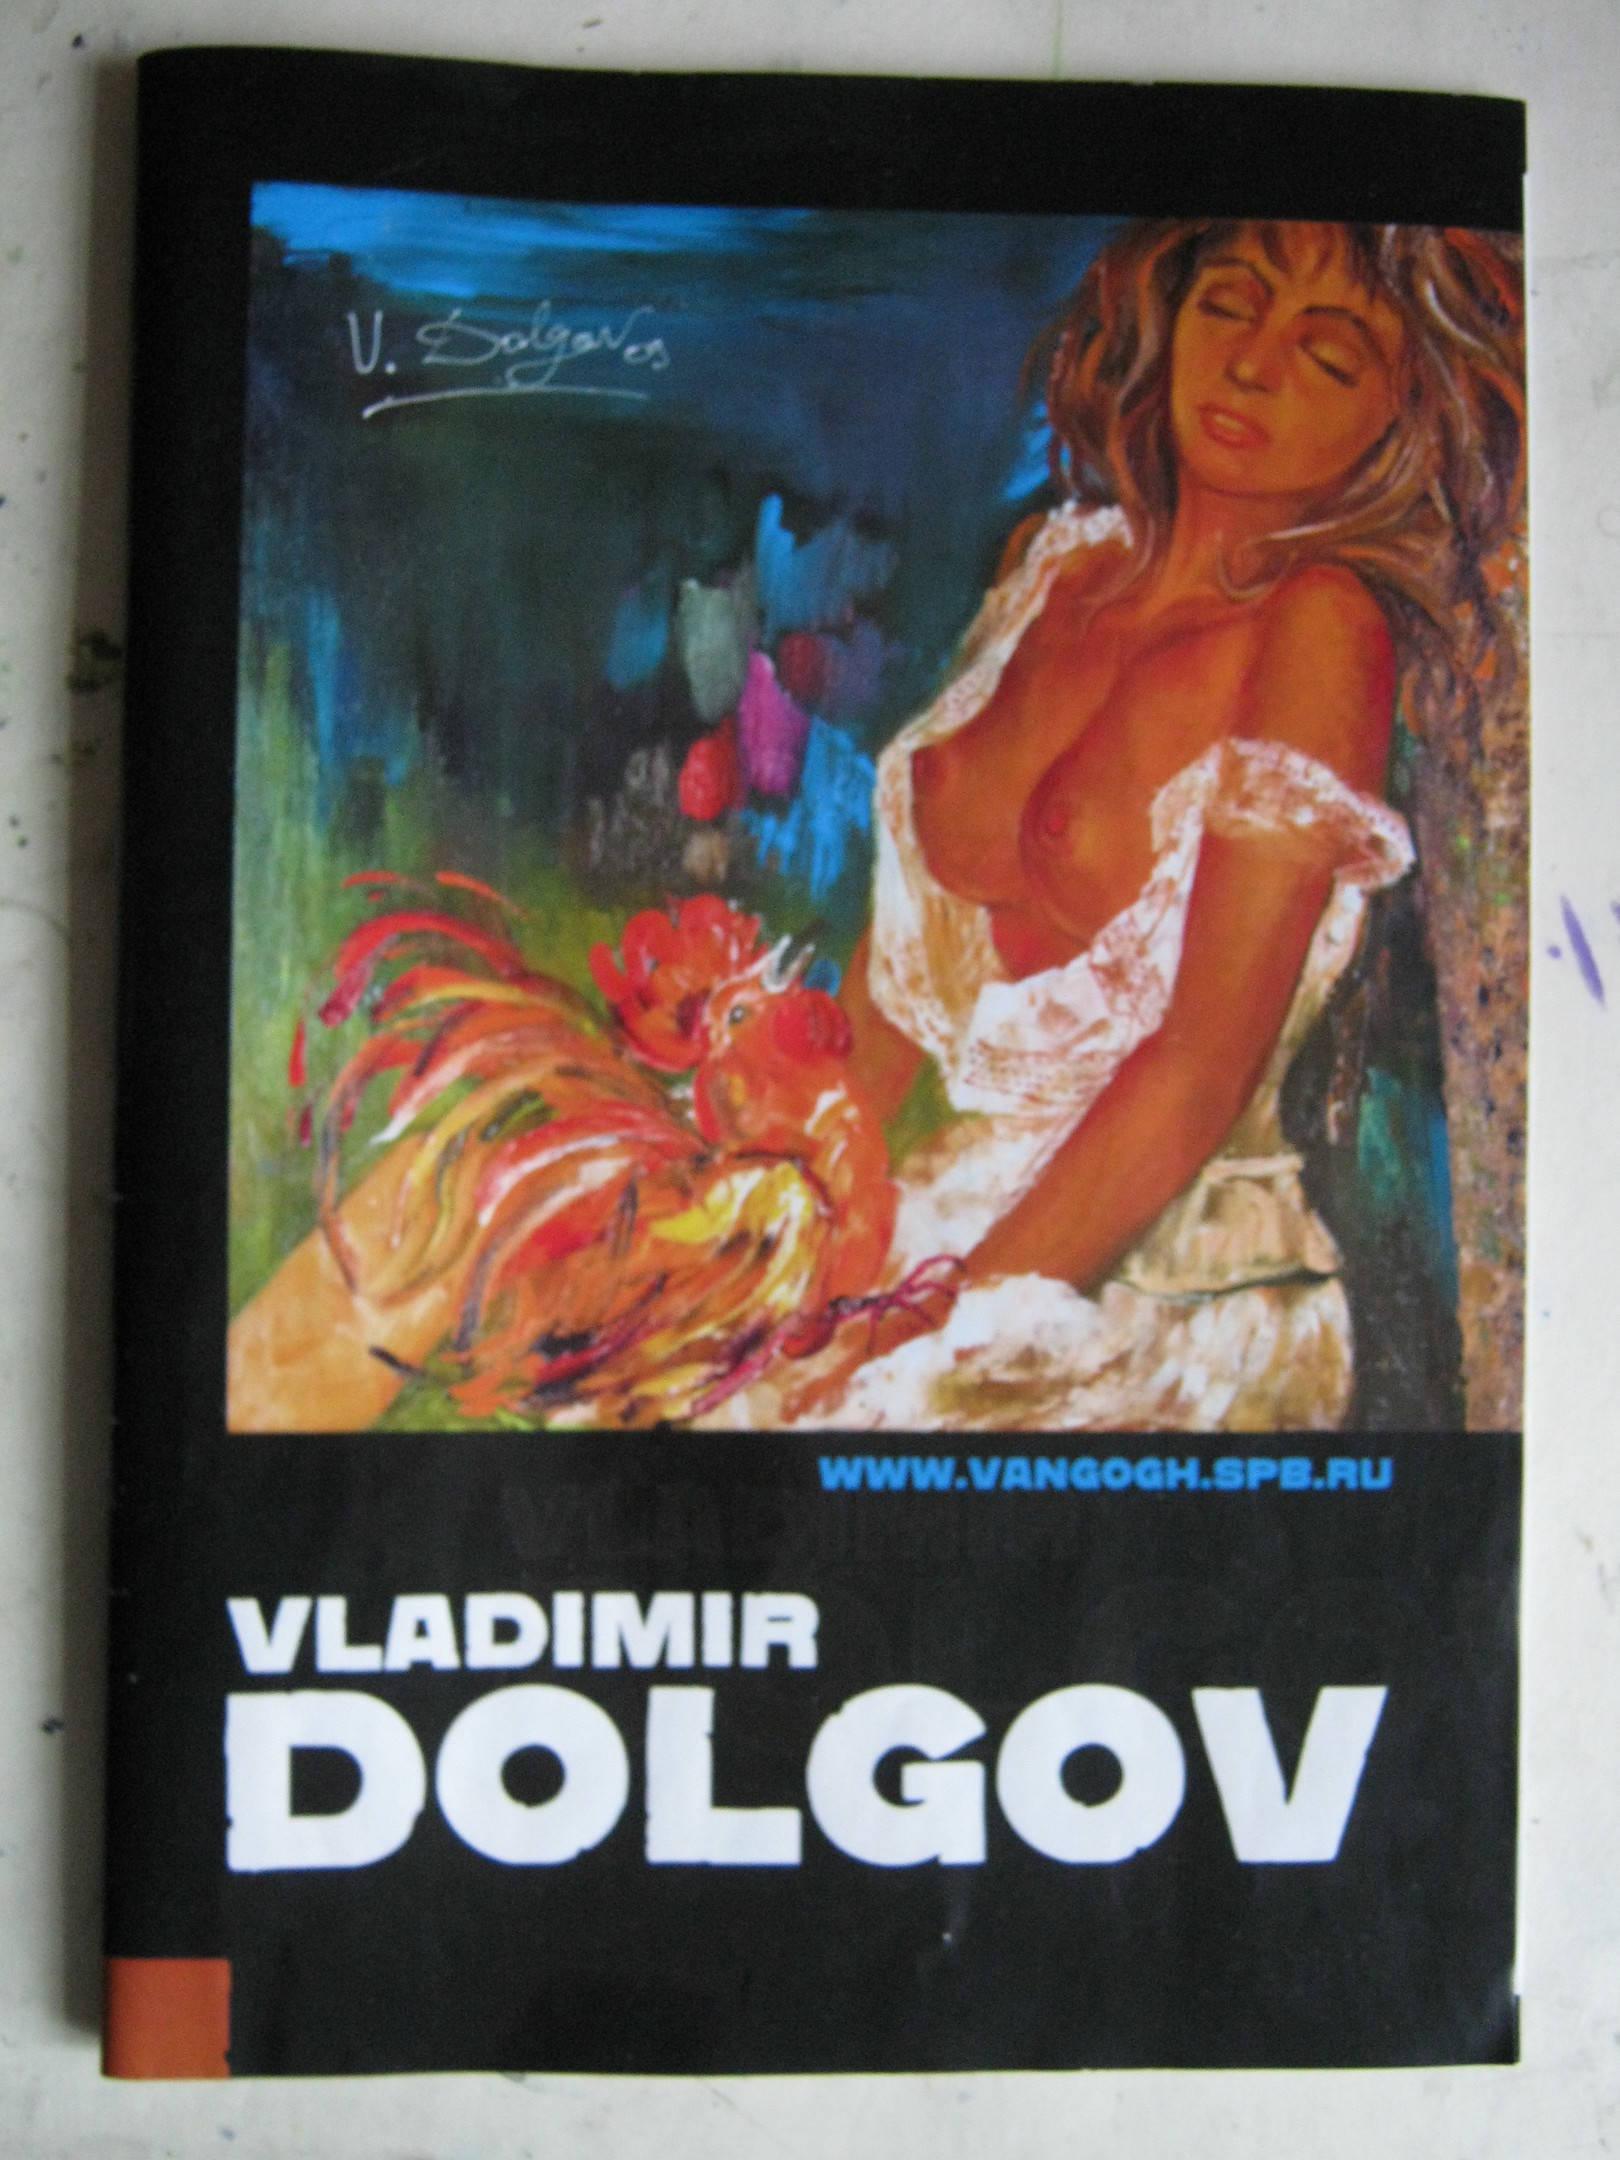 Vladimir Dolgov(Rusvangogh)